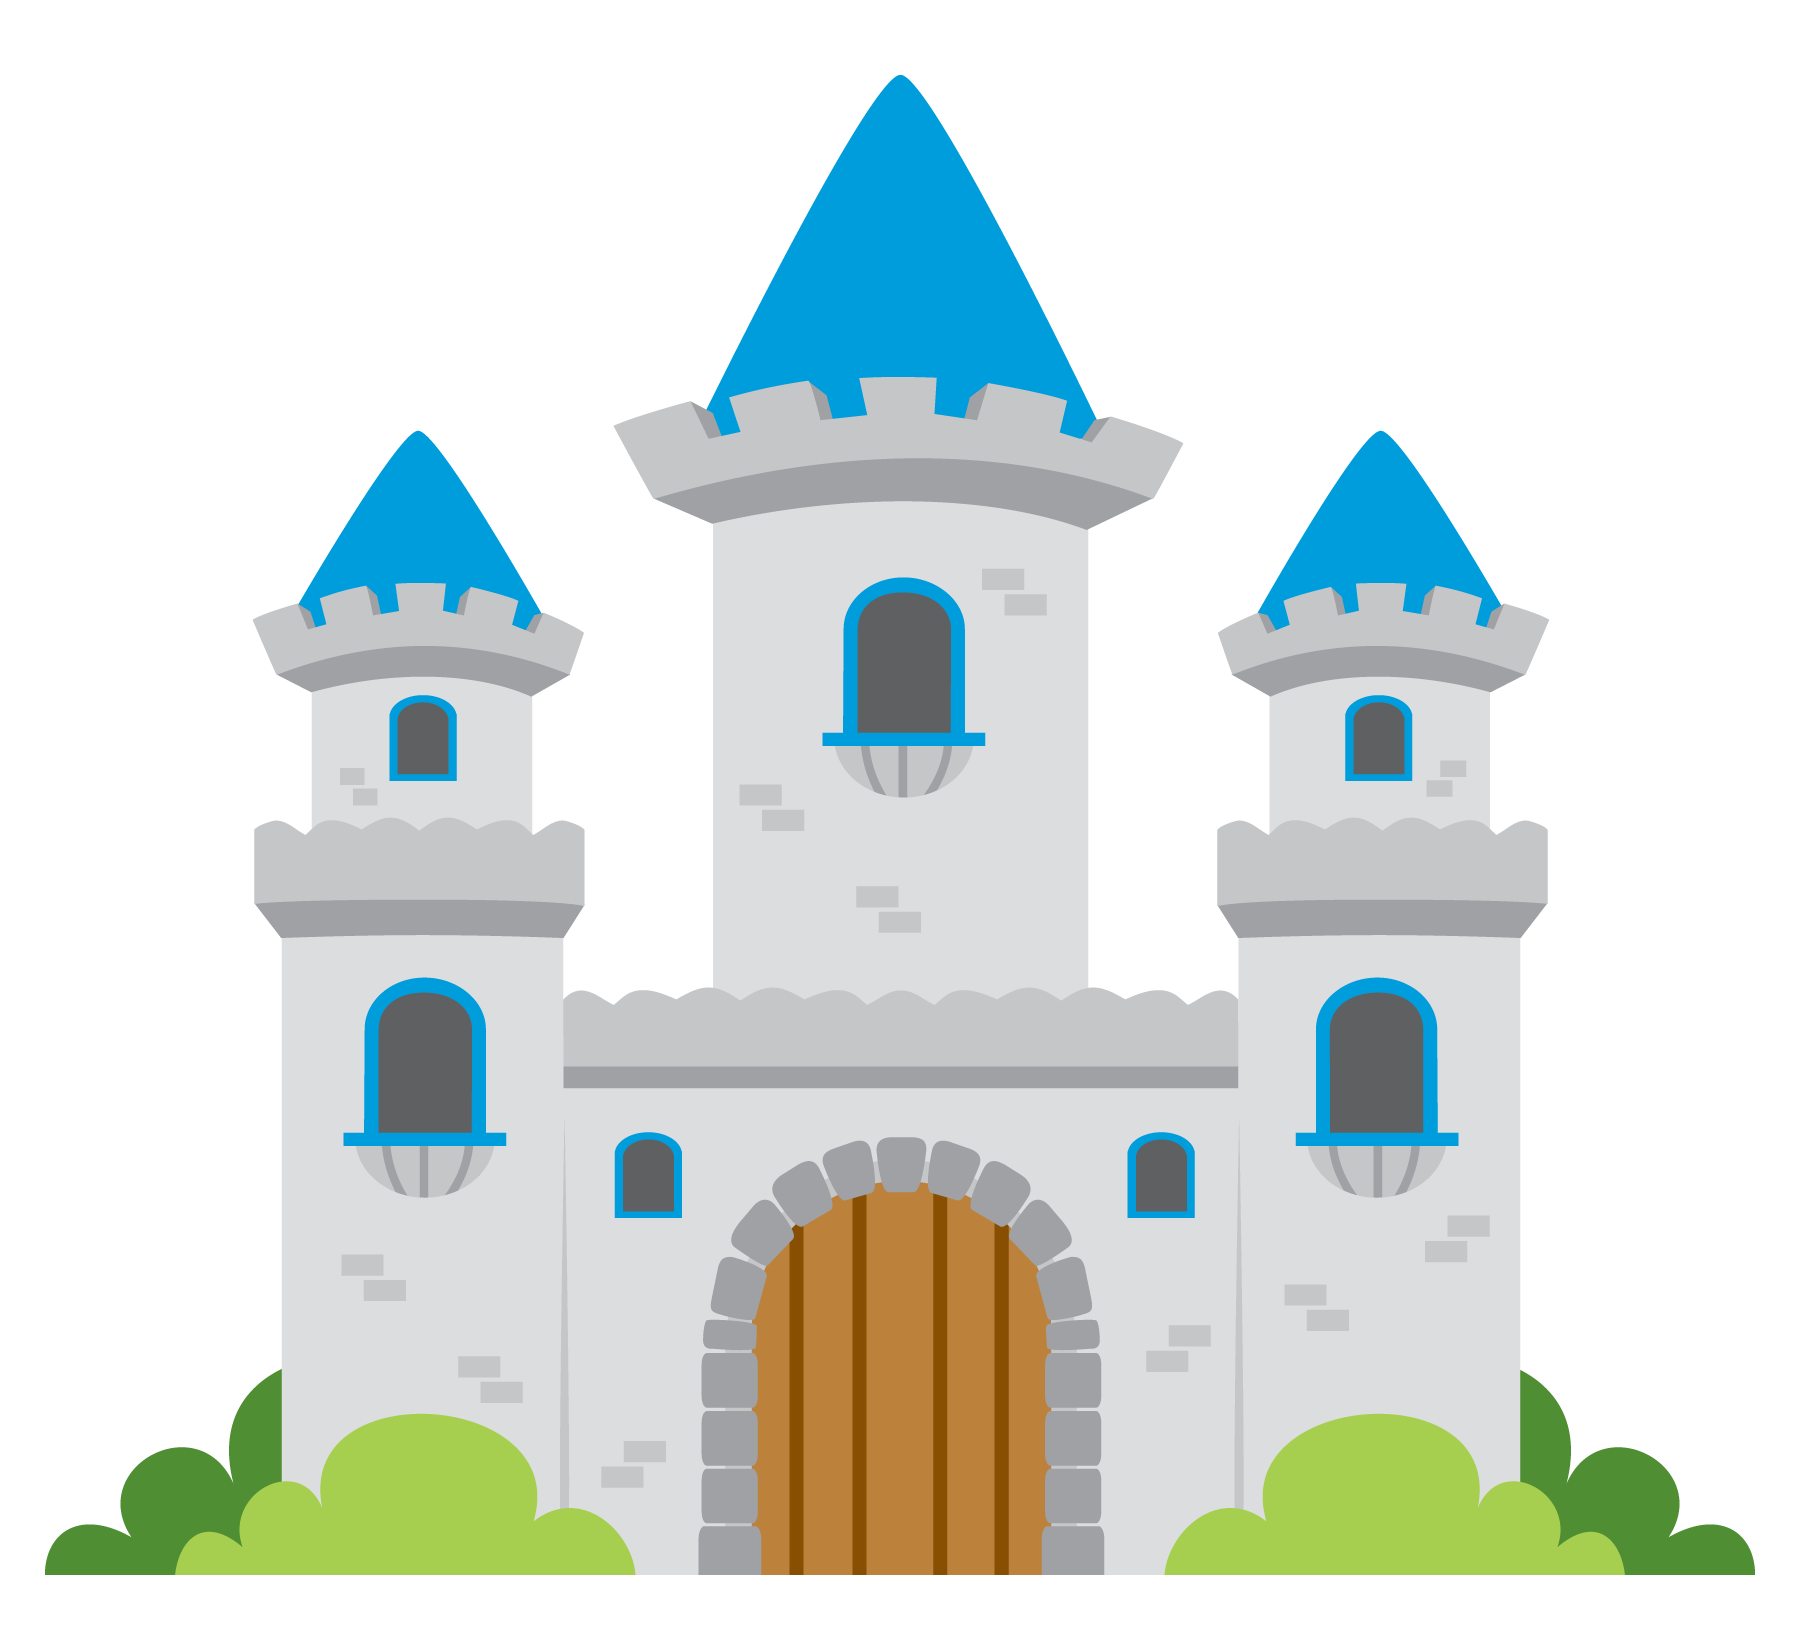 Clipart princess and castle scene for kids svg free Castle clipart free images | teacher recruitment | Castle clipart ... svg free